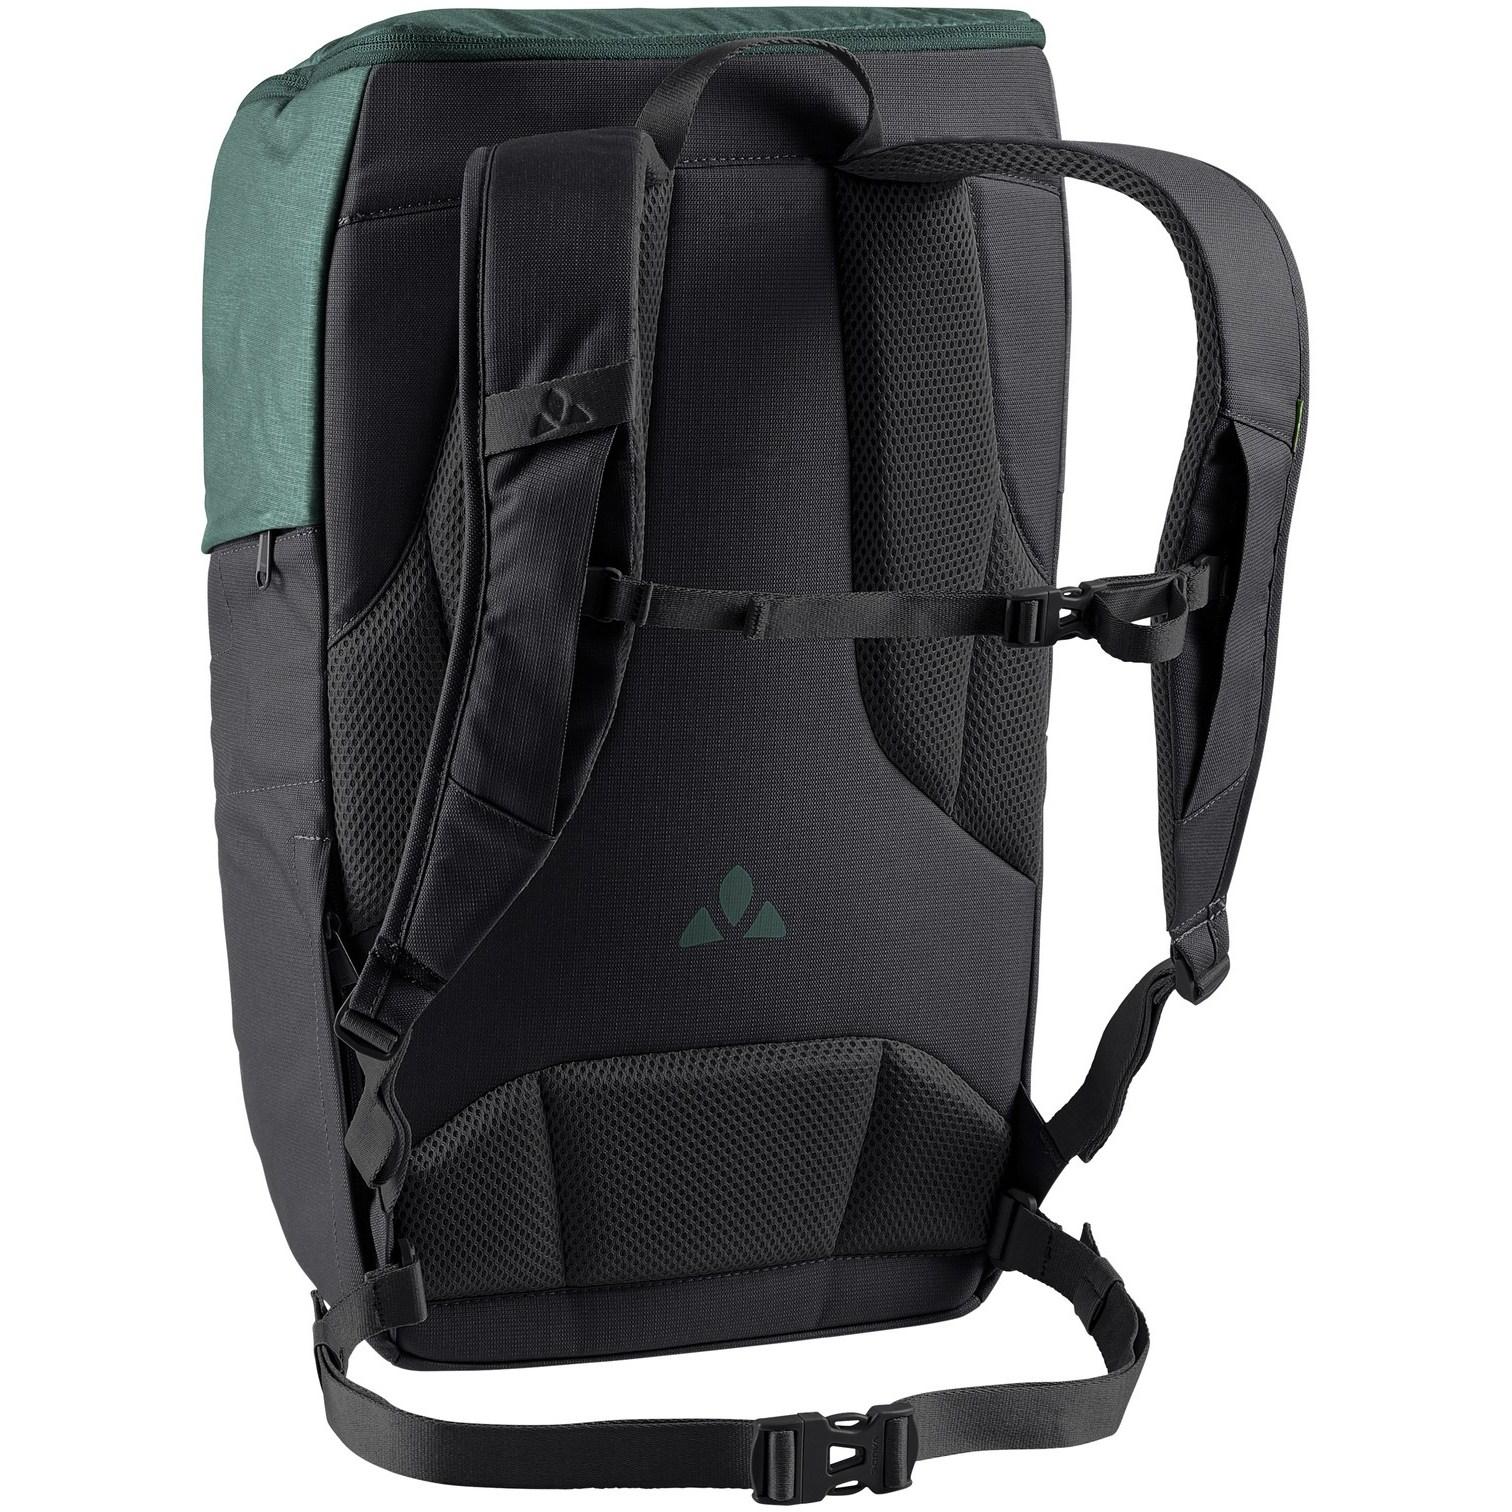 Image of Vaude Albali Backpack - black/dusty forest